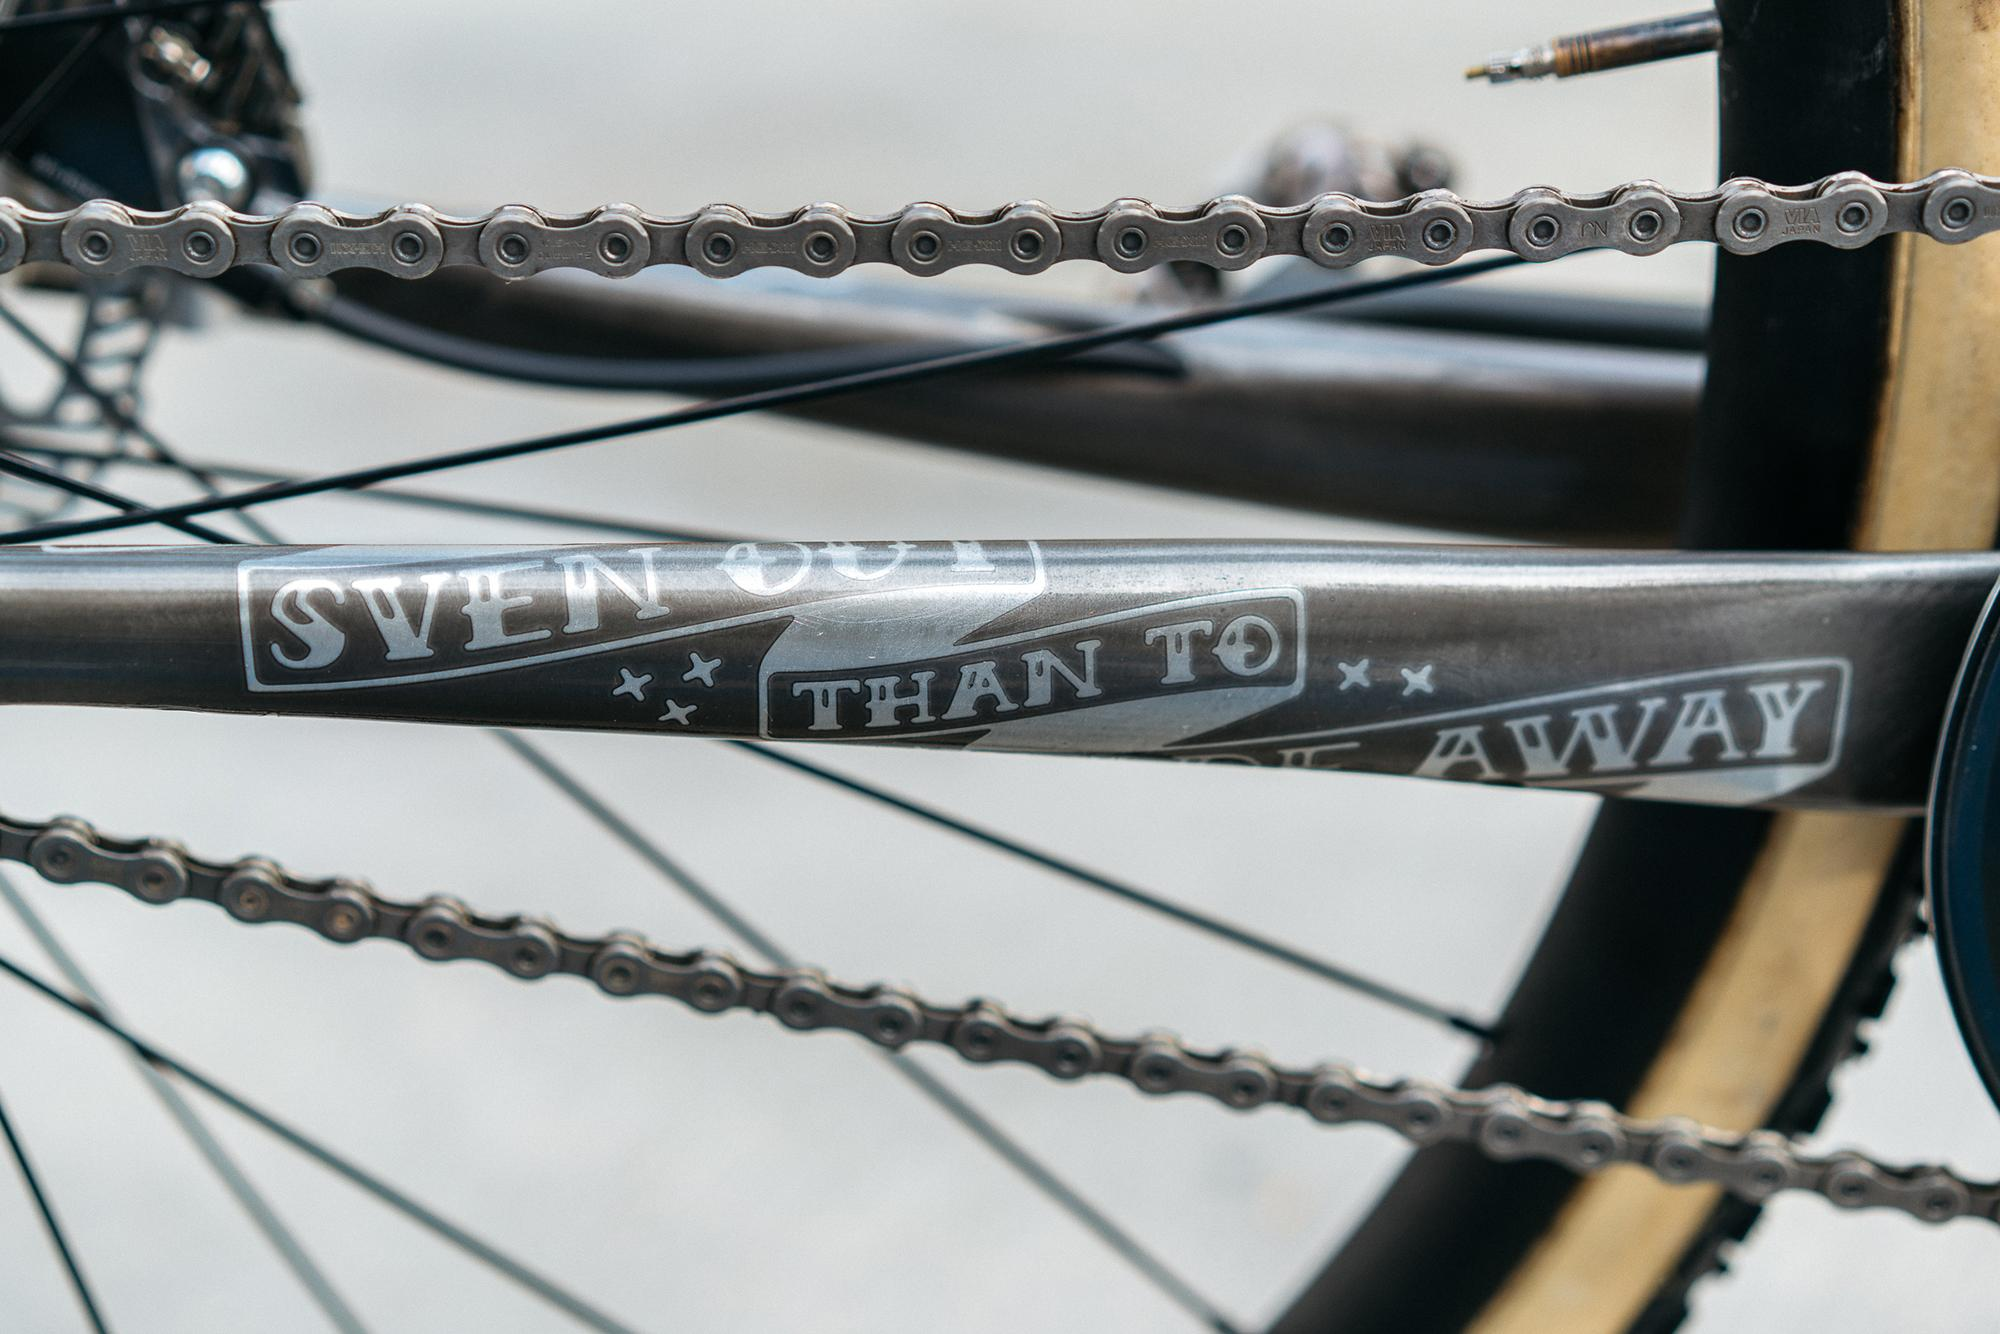 Sven Nys' SSCXWC Bike photo by Sean Talkington